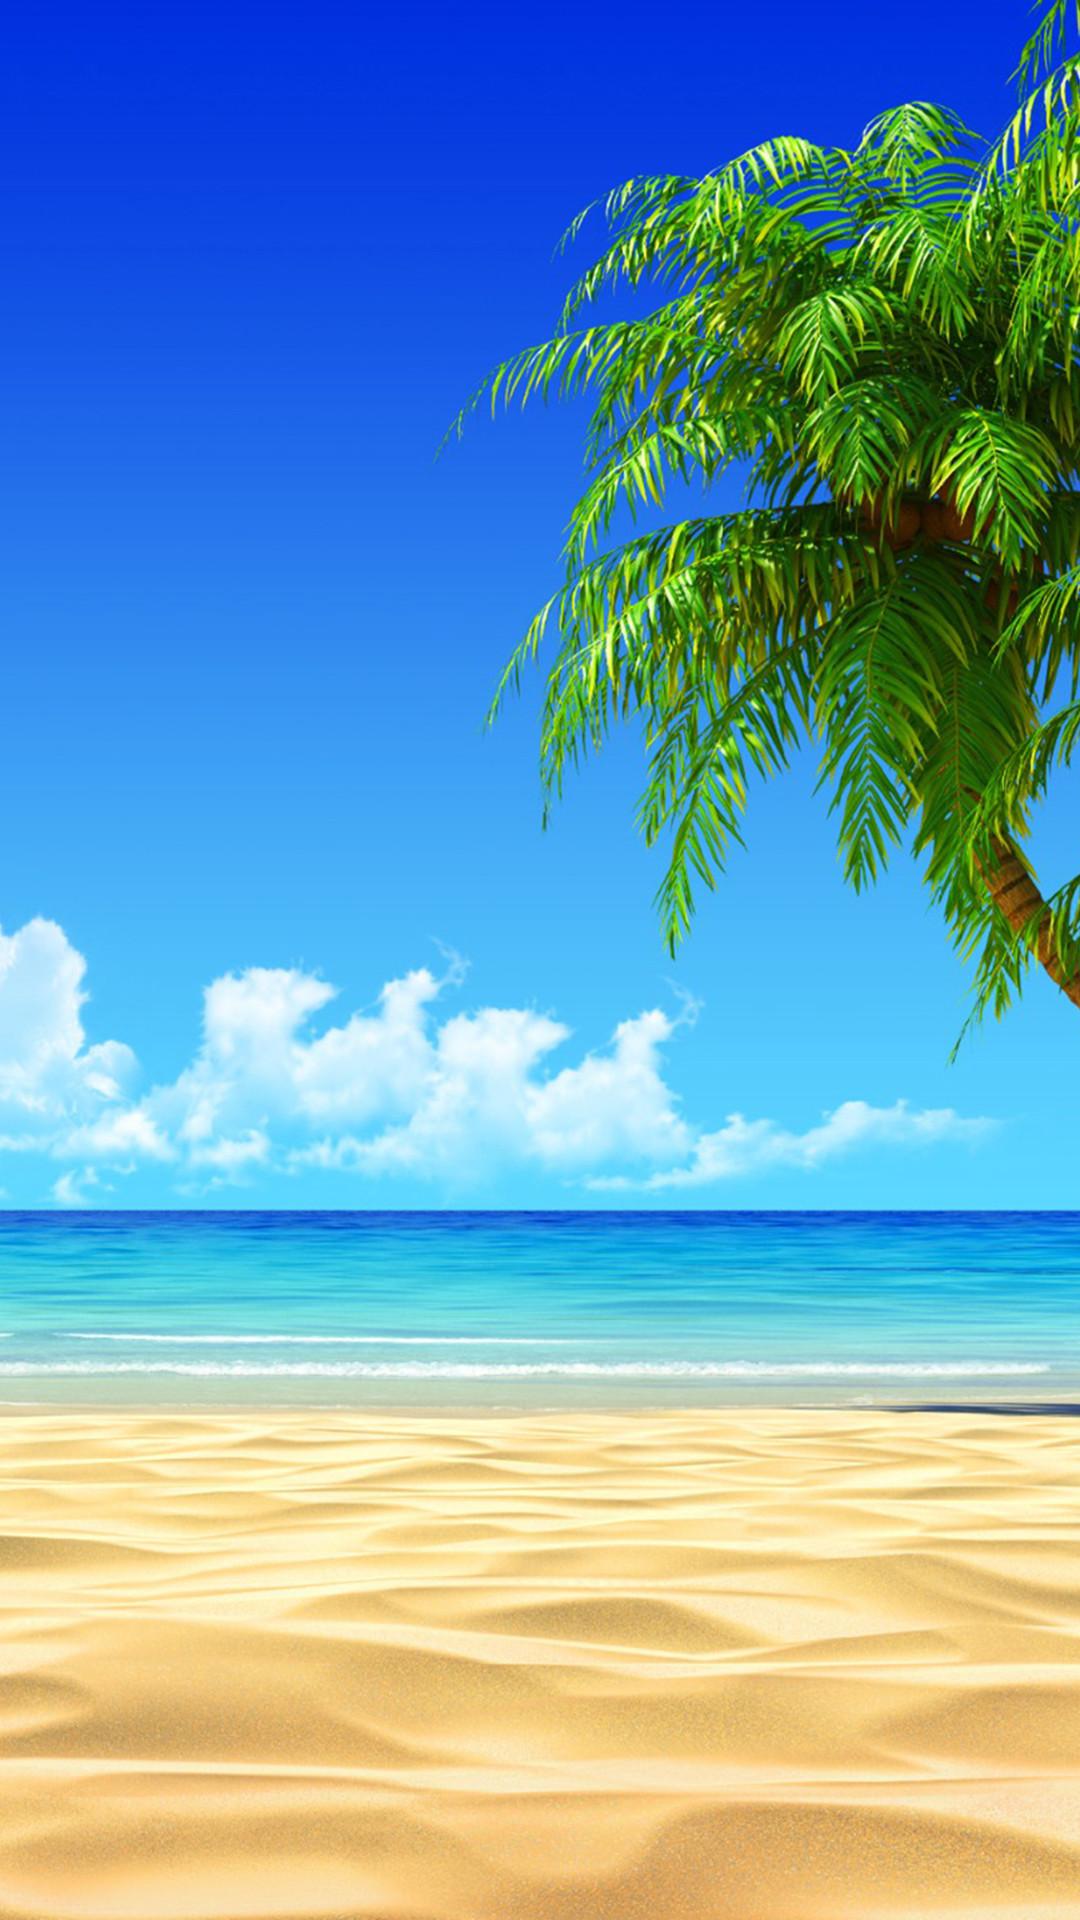 … free hd beach iphone wallpapers pixelstalk net …